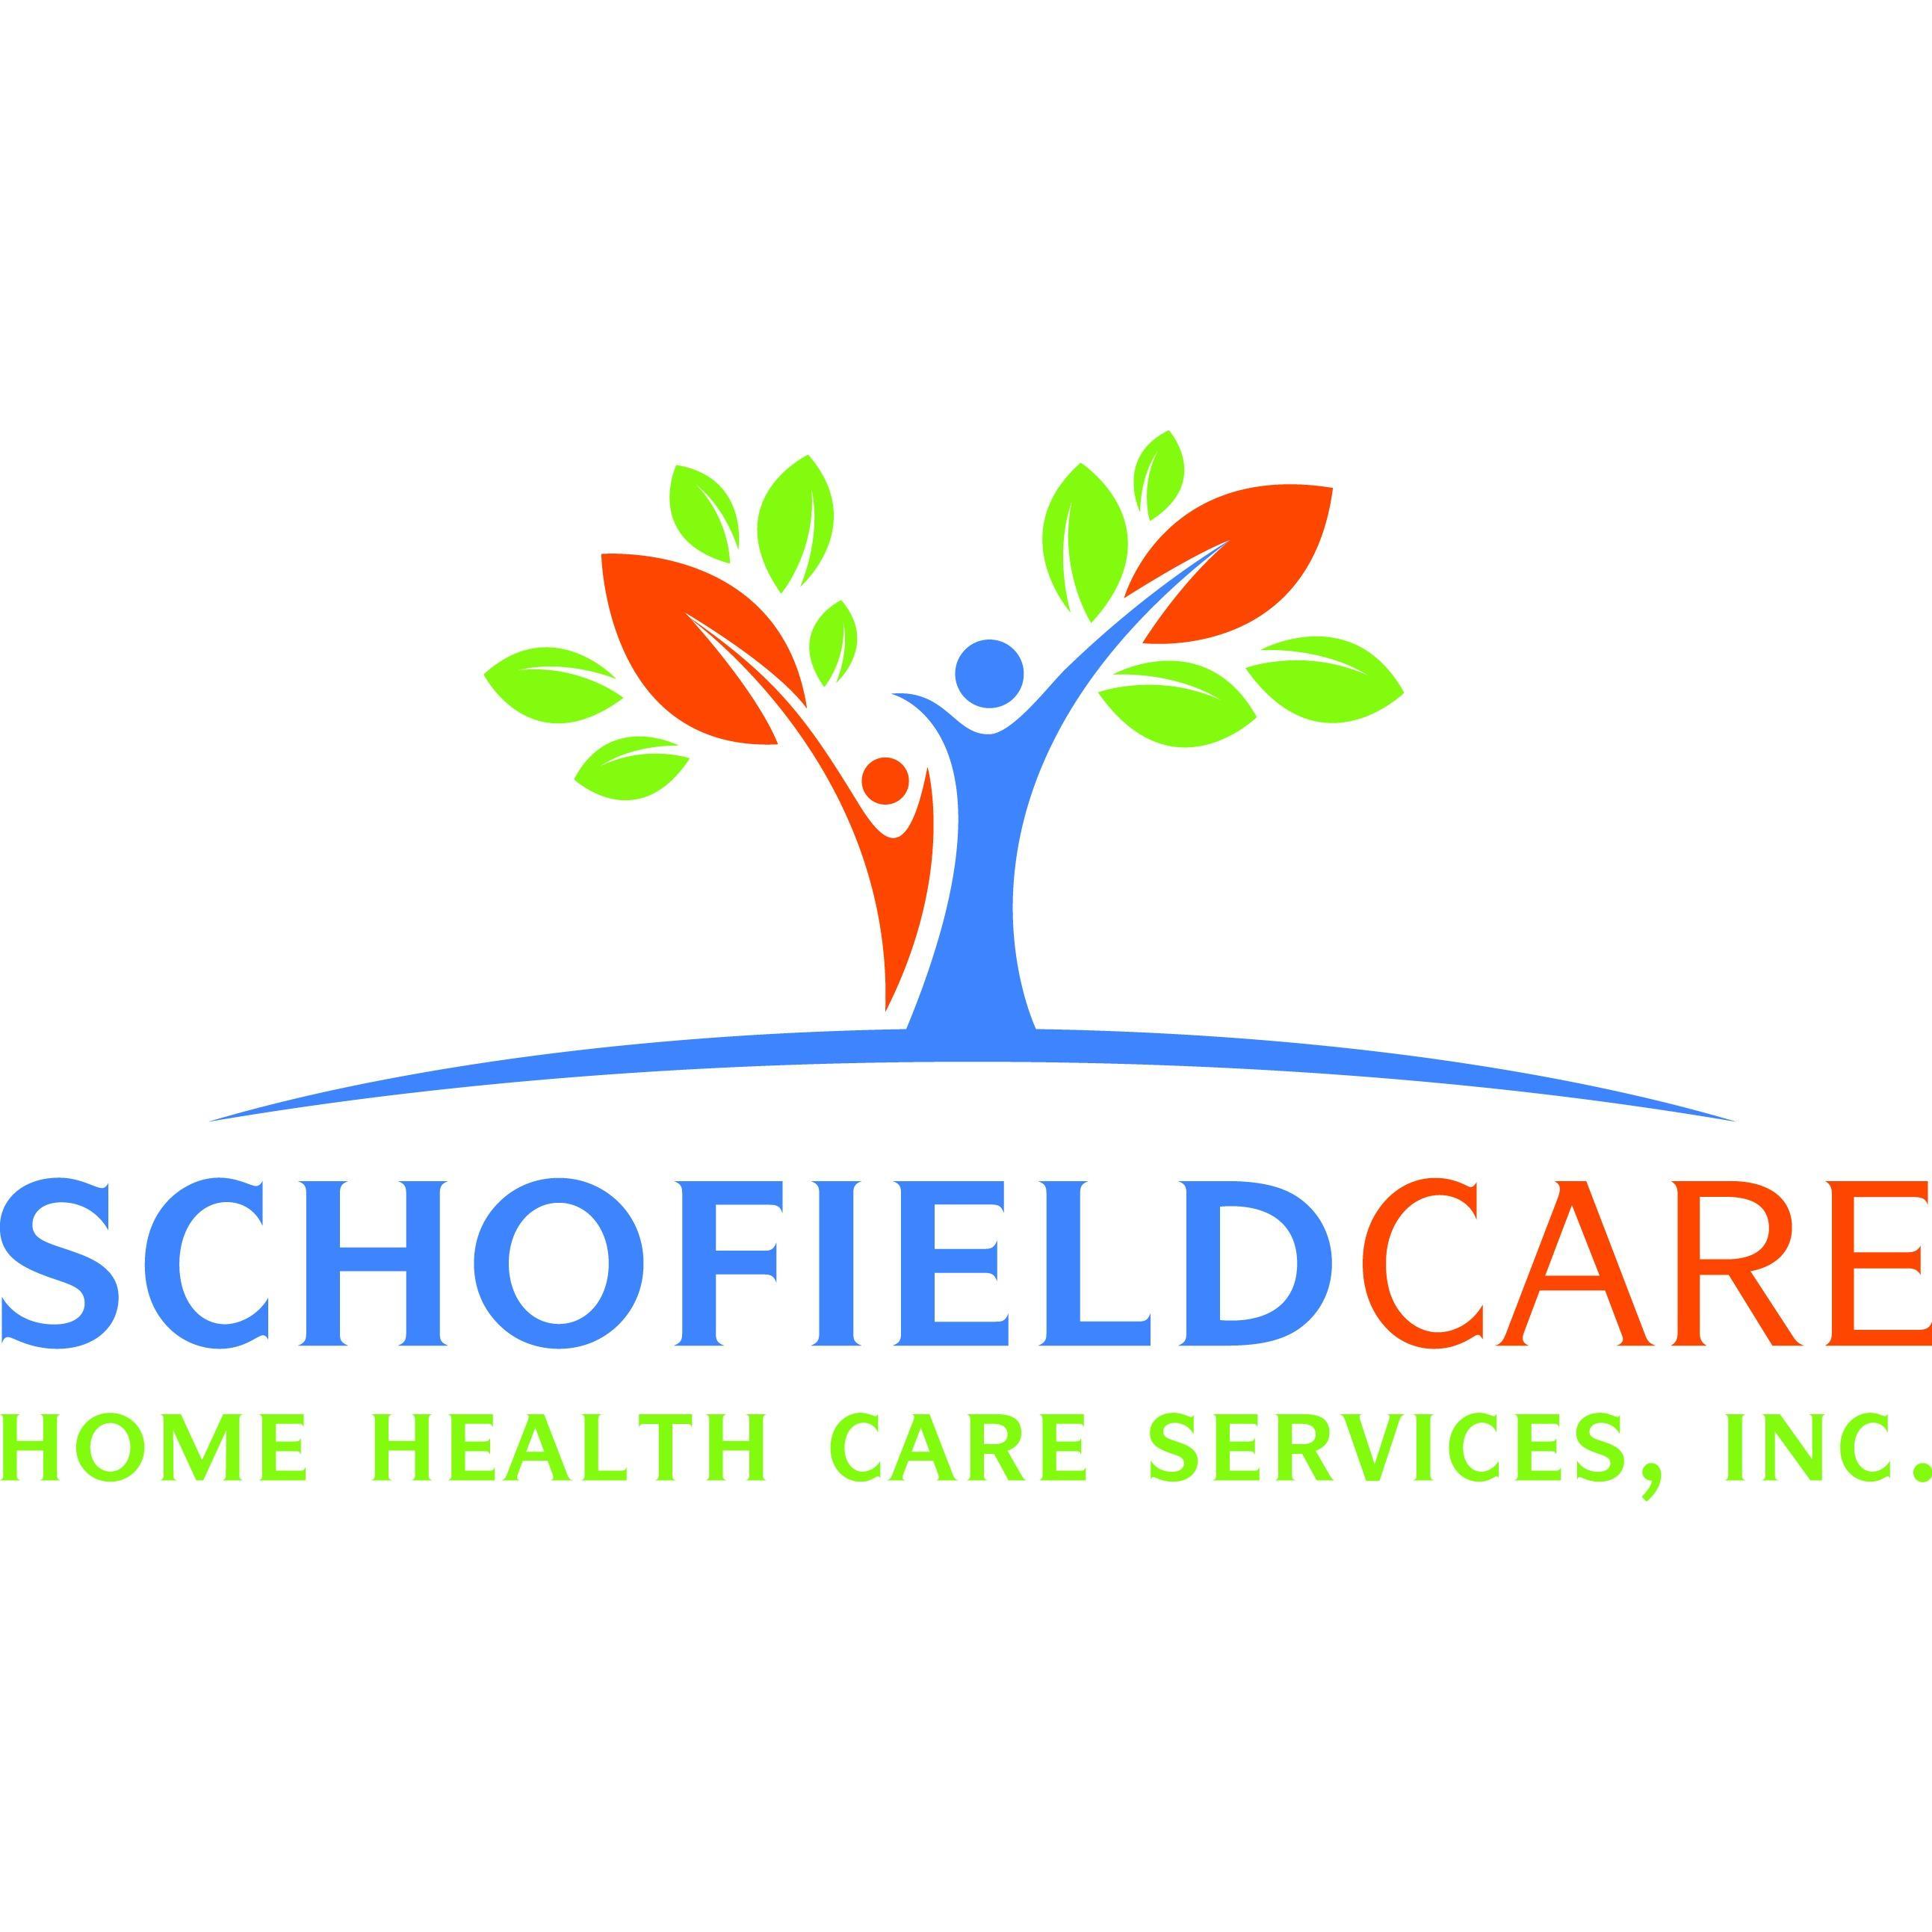 Schofield Home Health Care Services